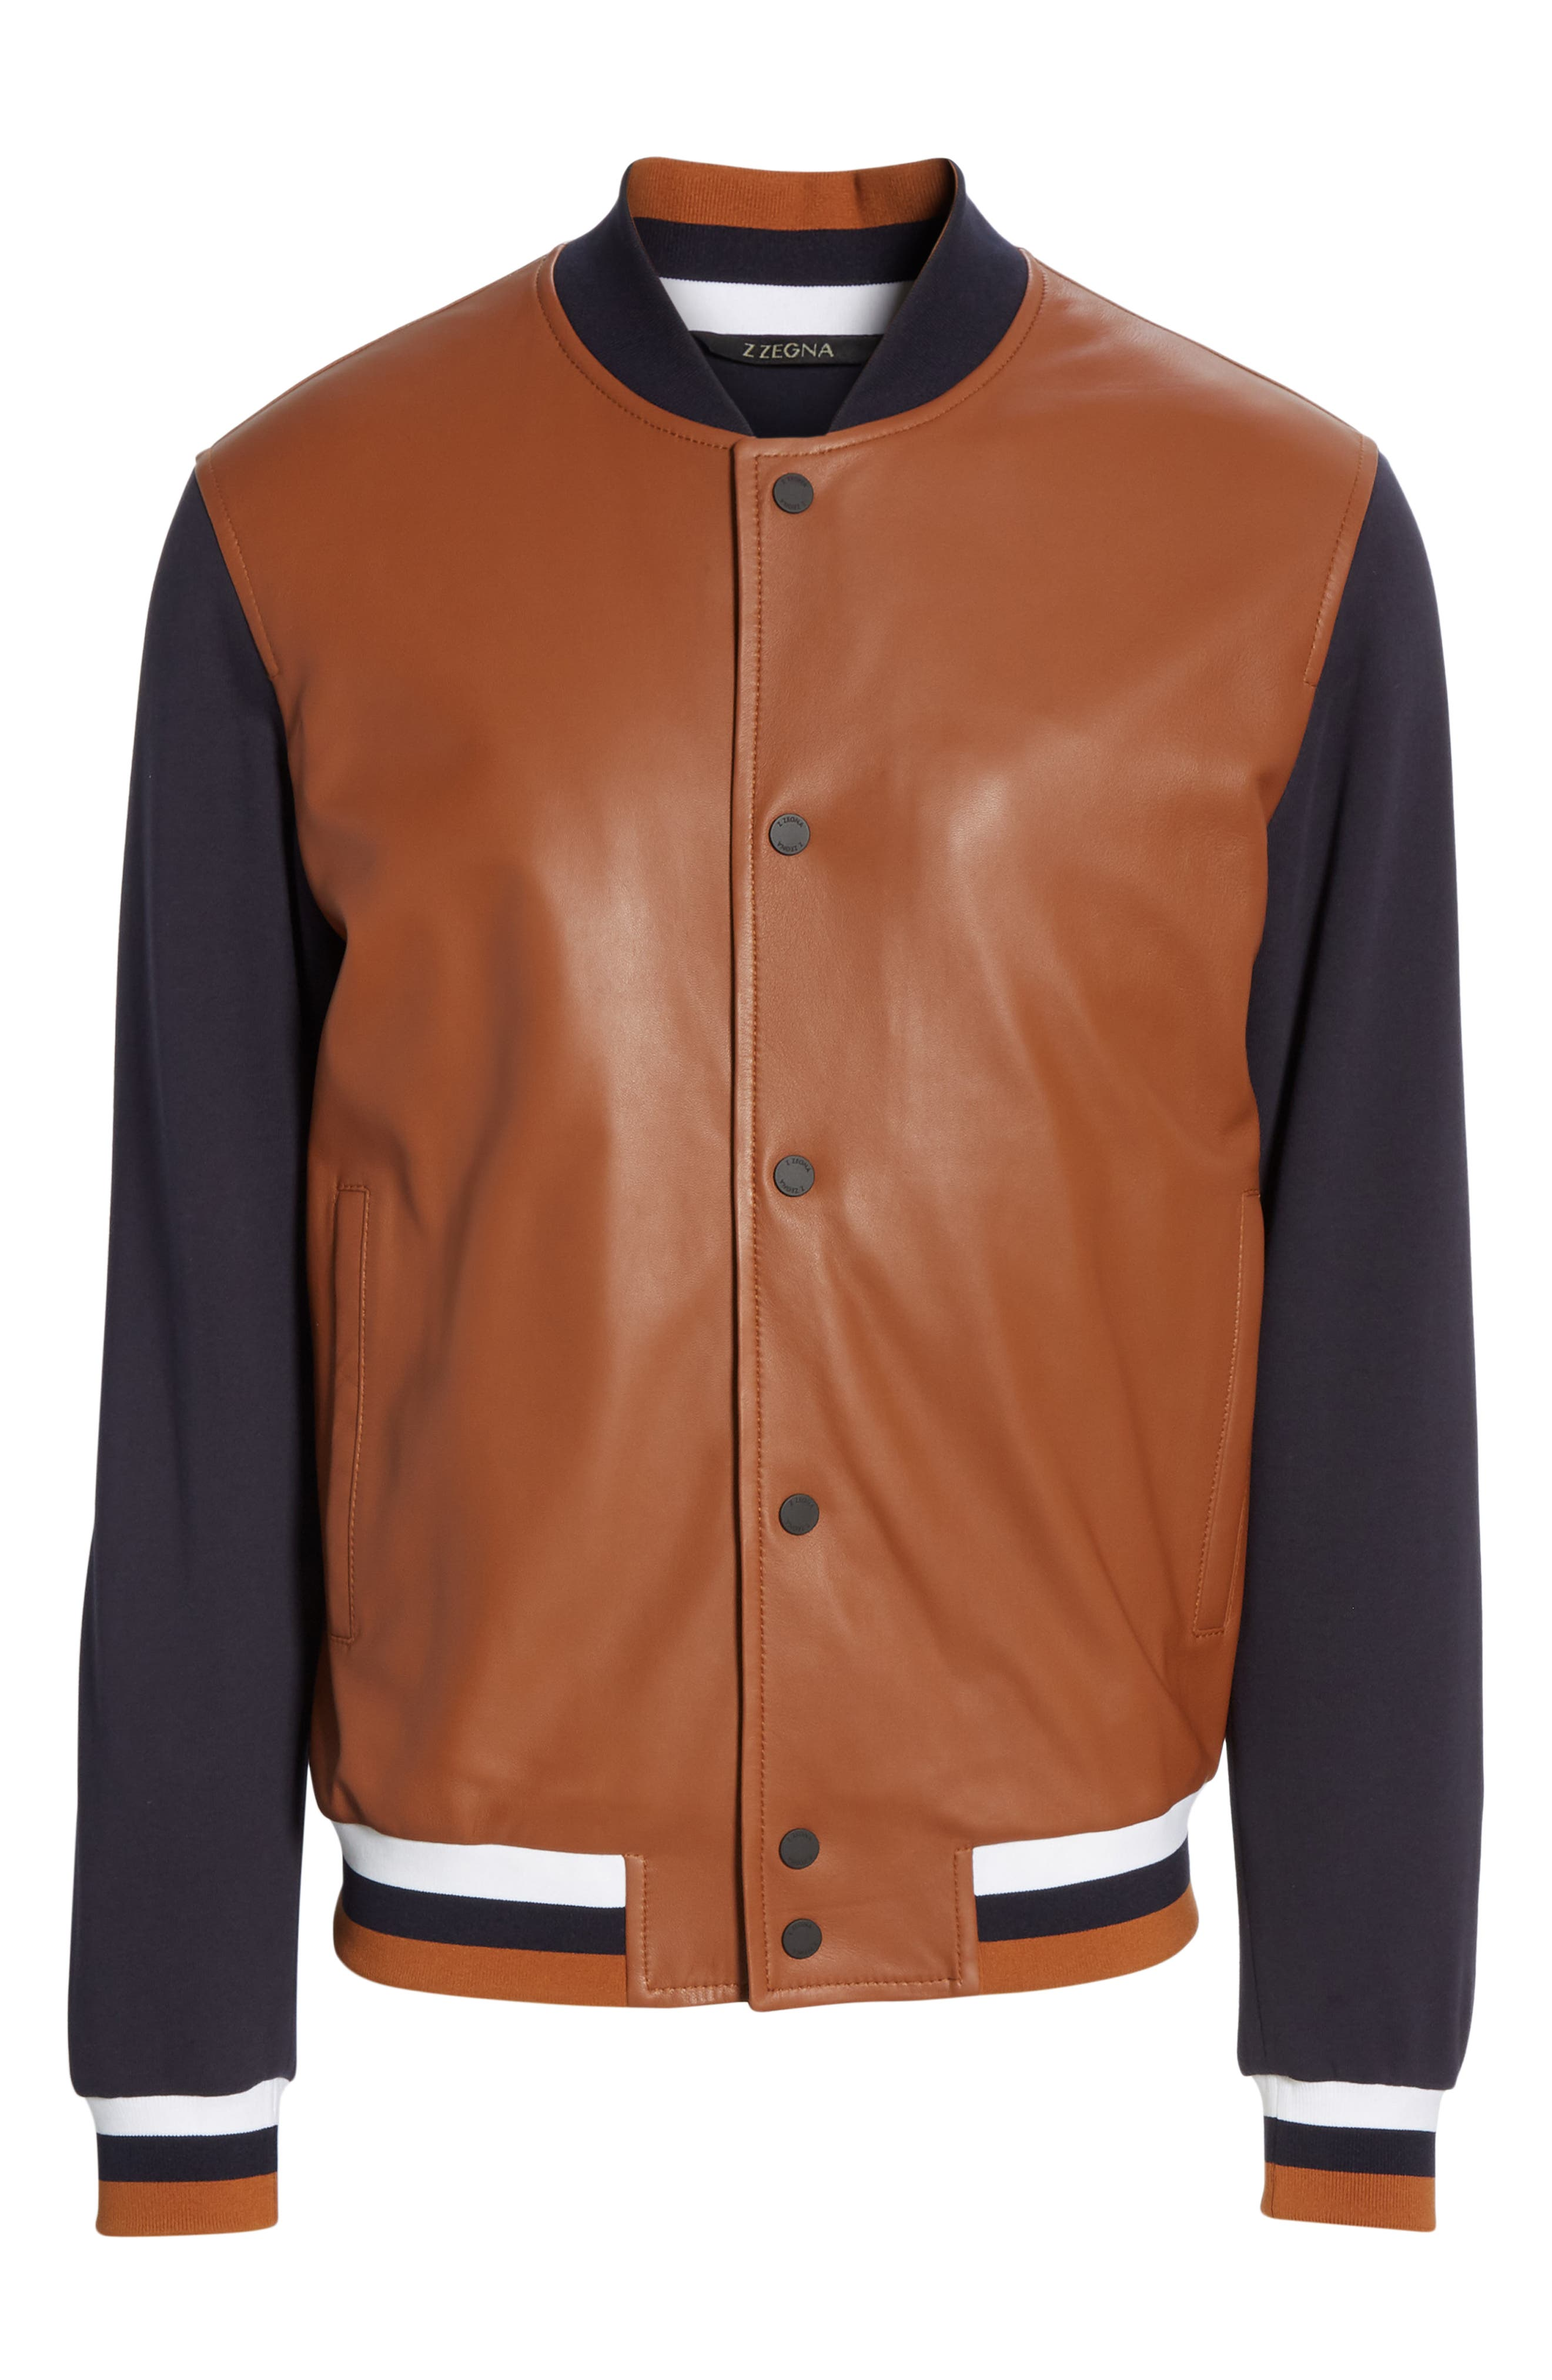 Z ZEGNA, Contrast Leather Bomber Jacket, Alternate thumbnail 5, color, NAVY/ BROWN